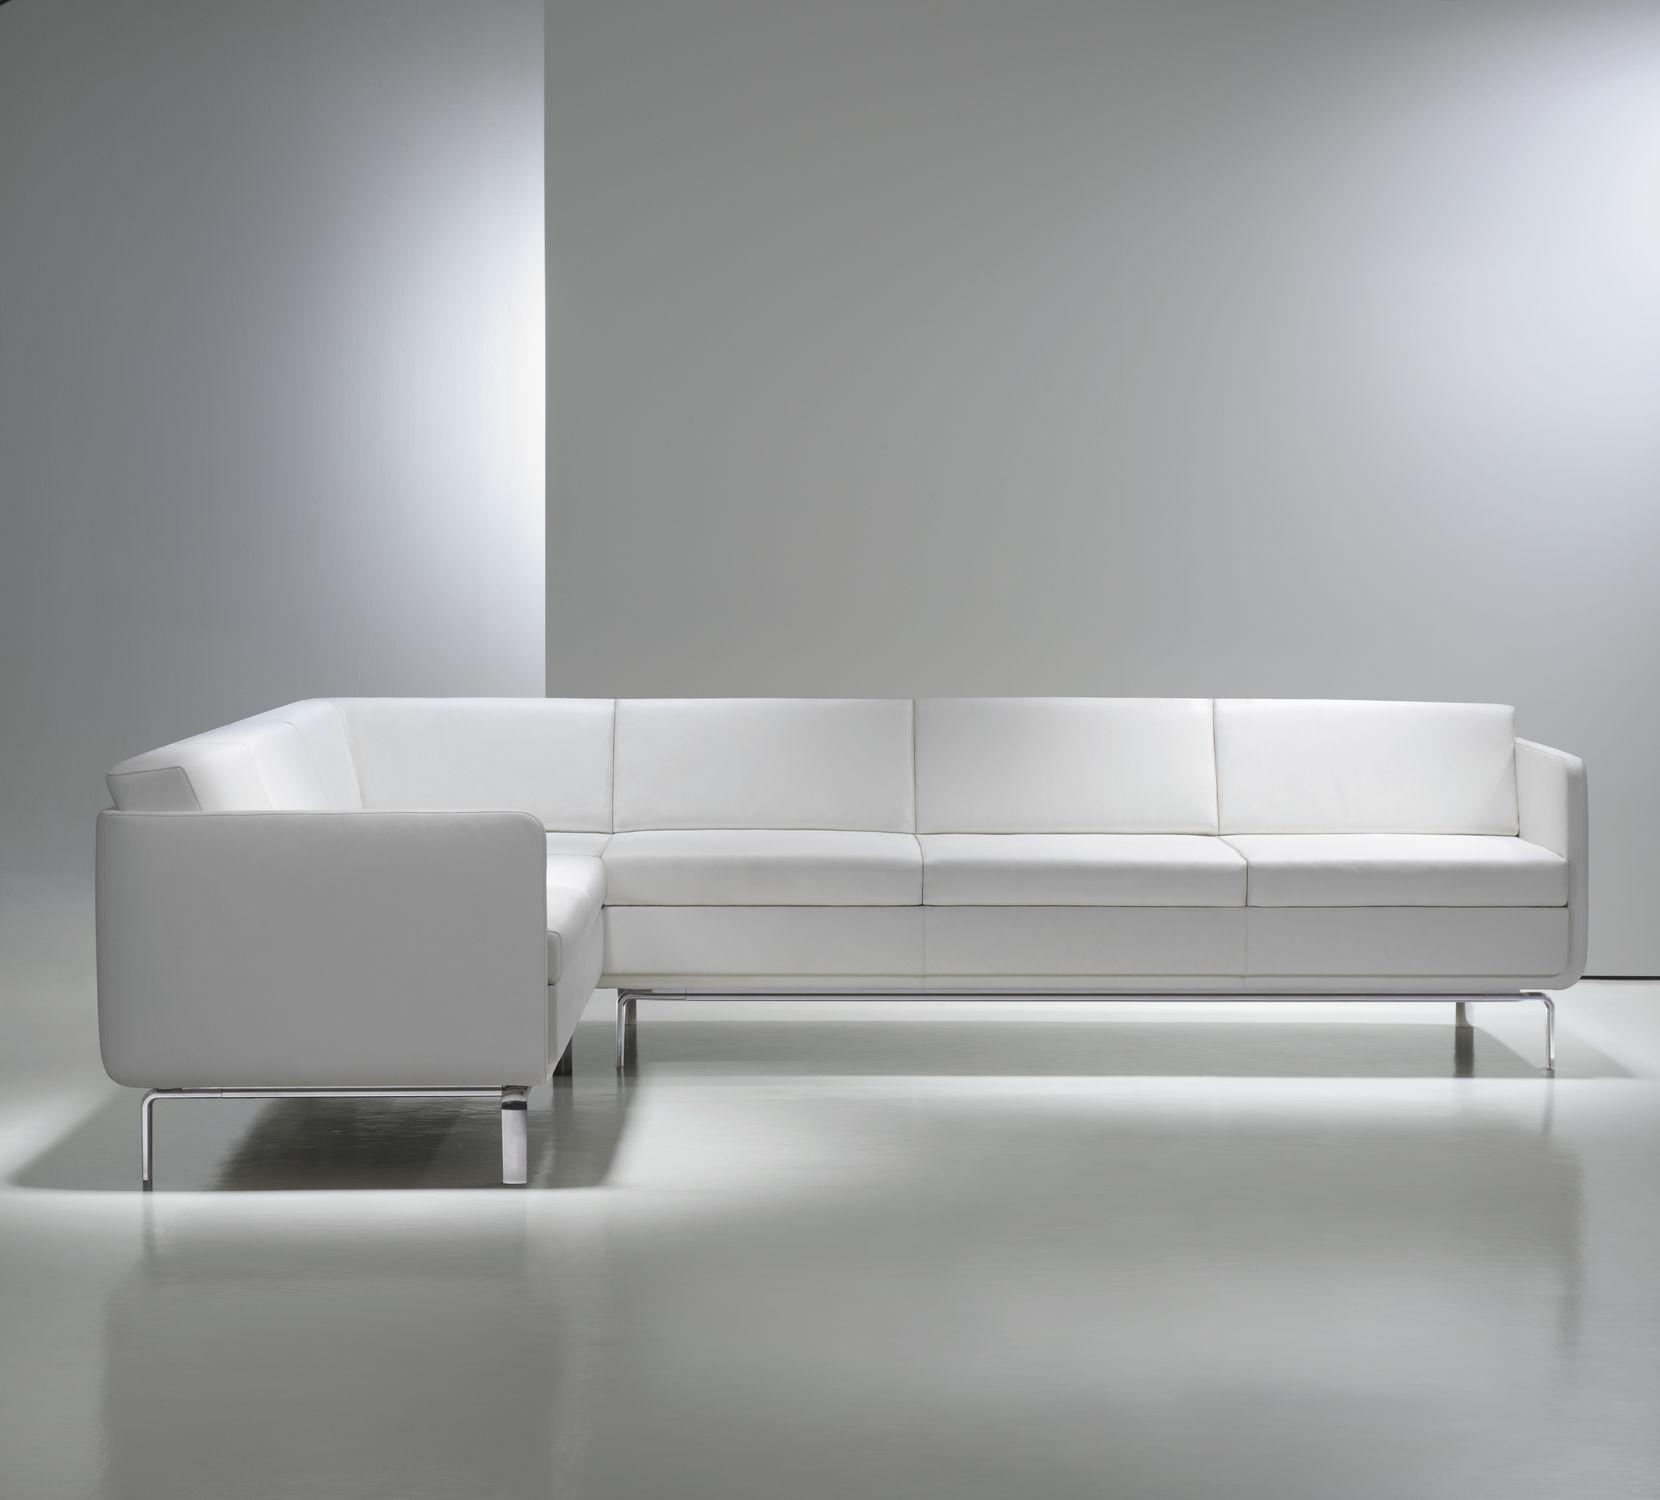 Design ecksofa  Ecksofa / modern / Stoff / von Arik Levy - GAIA - BERNHARD design